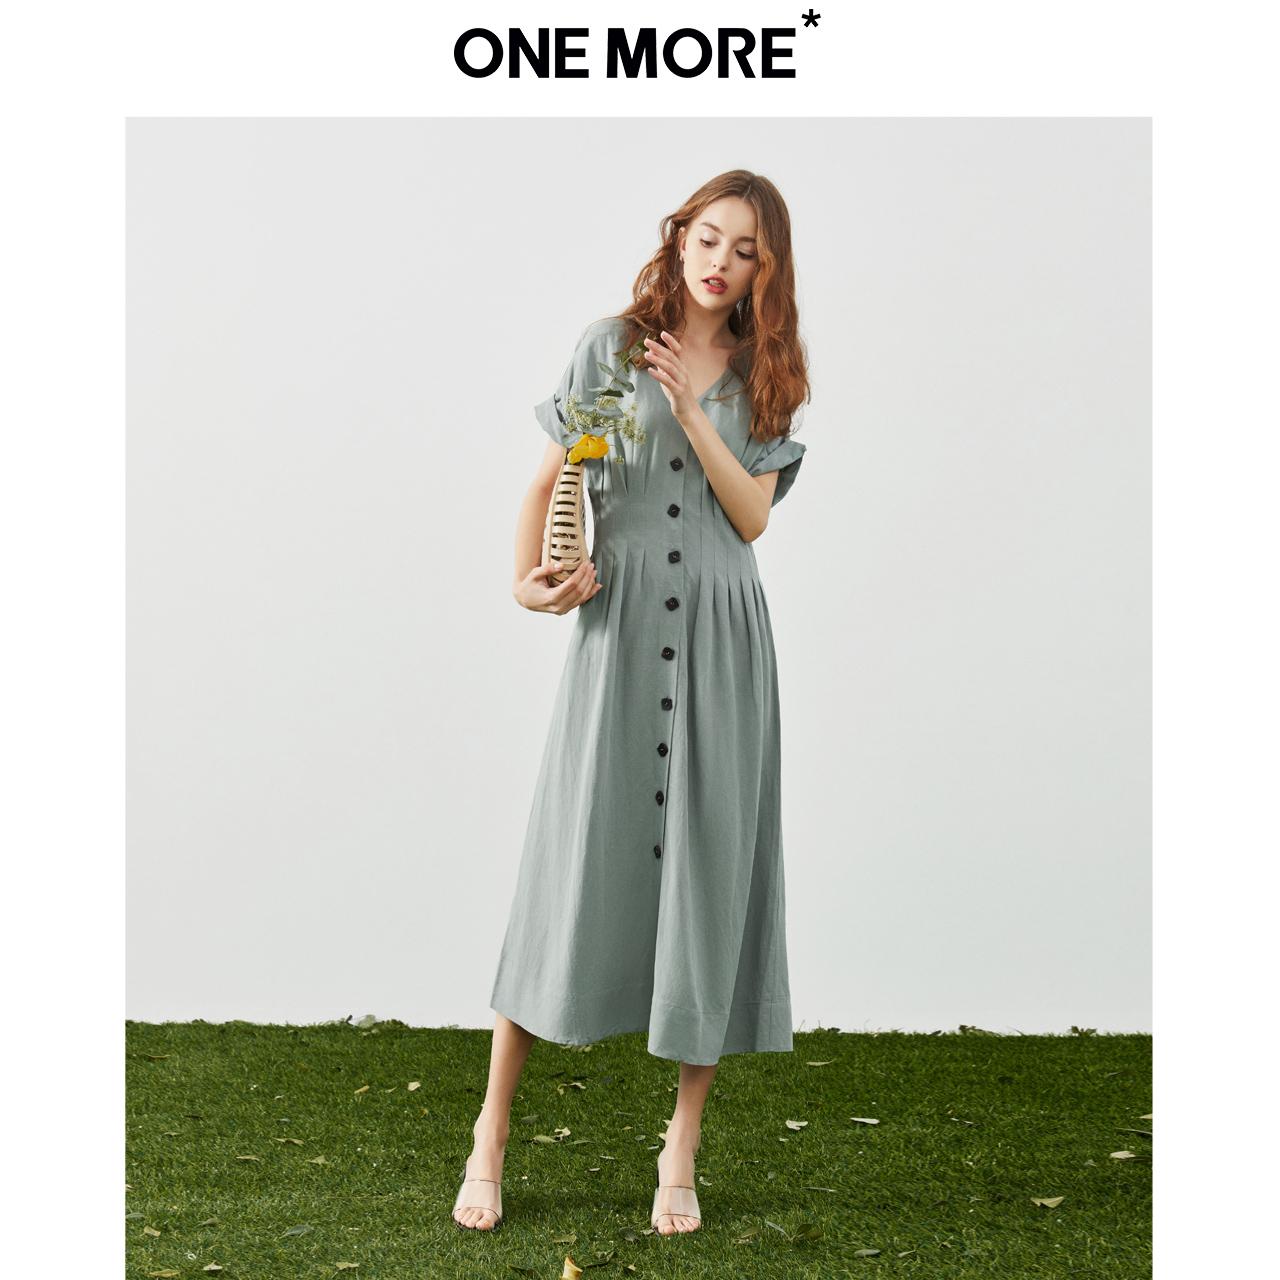 ONE MORE2020夏季新款法式连袖连衣裙设计感优雅气质长款裙子女装